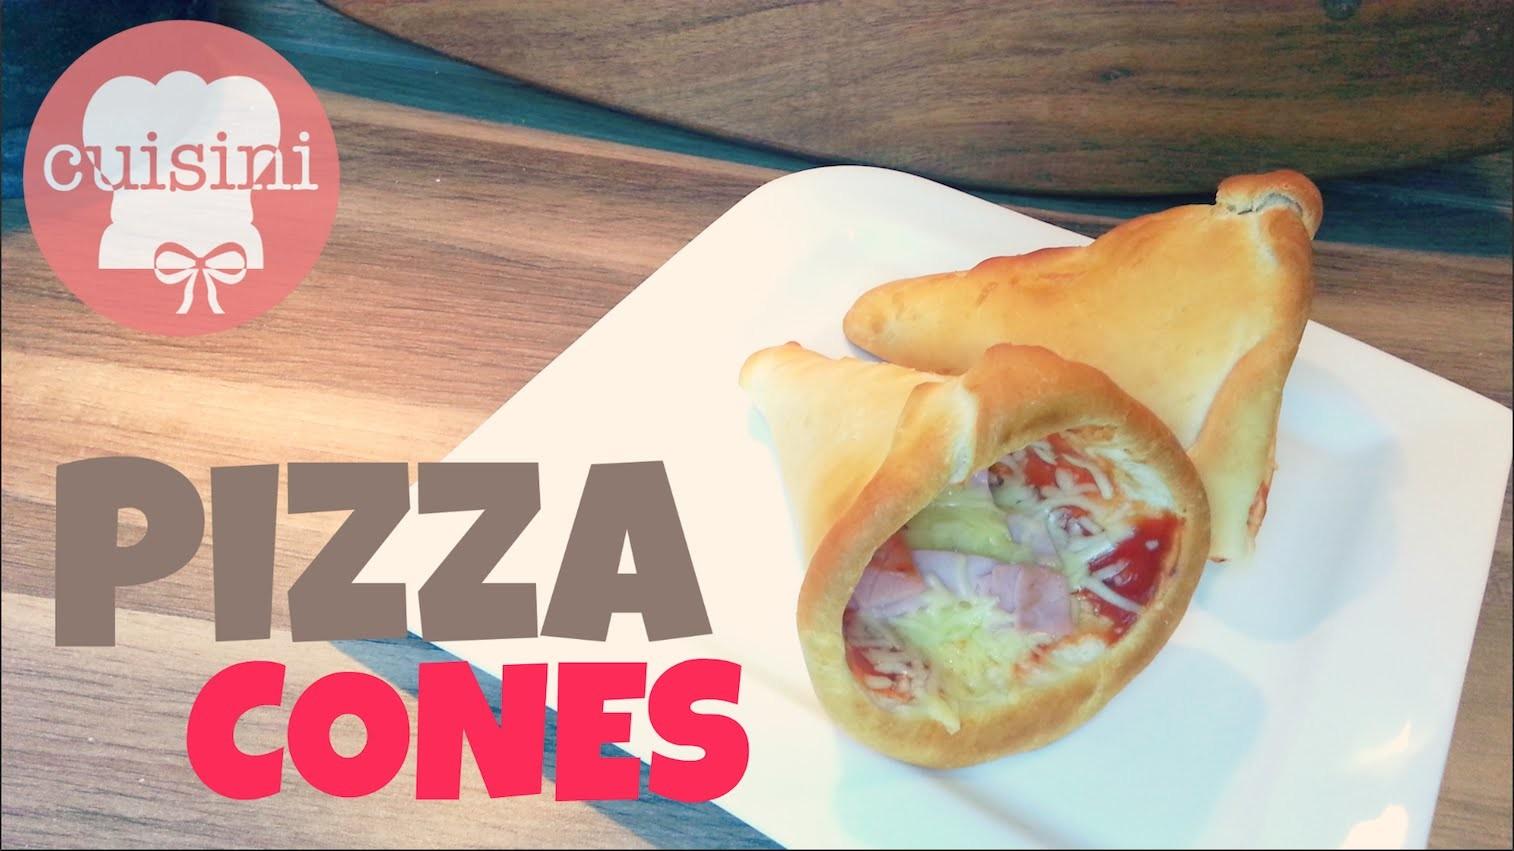 PIZZA CONES | DIY Pizzahüte selber machen (deutsch) - CUISINI